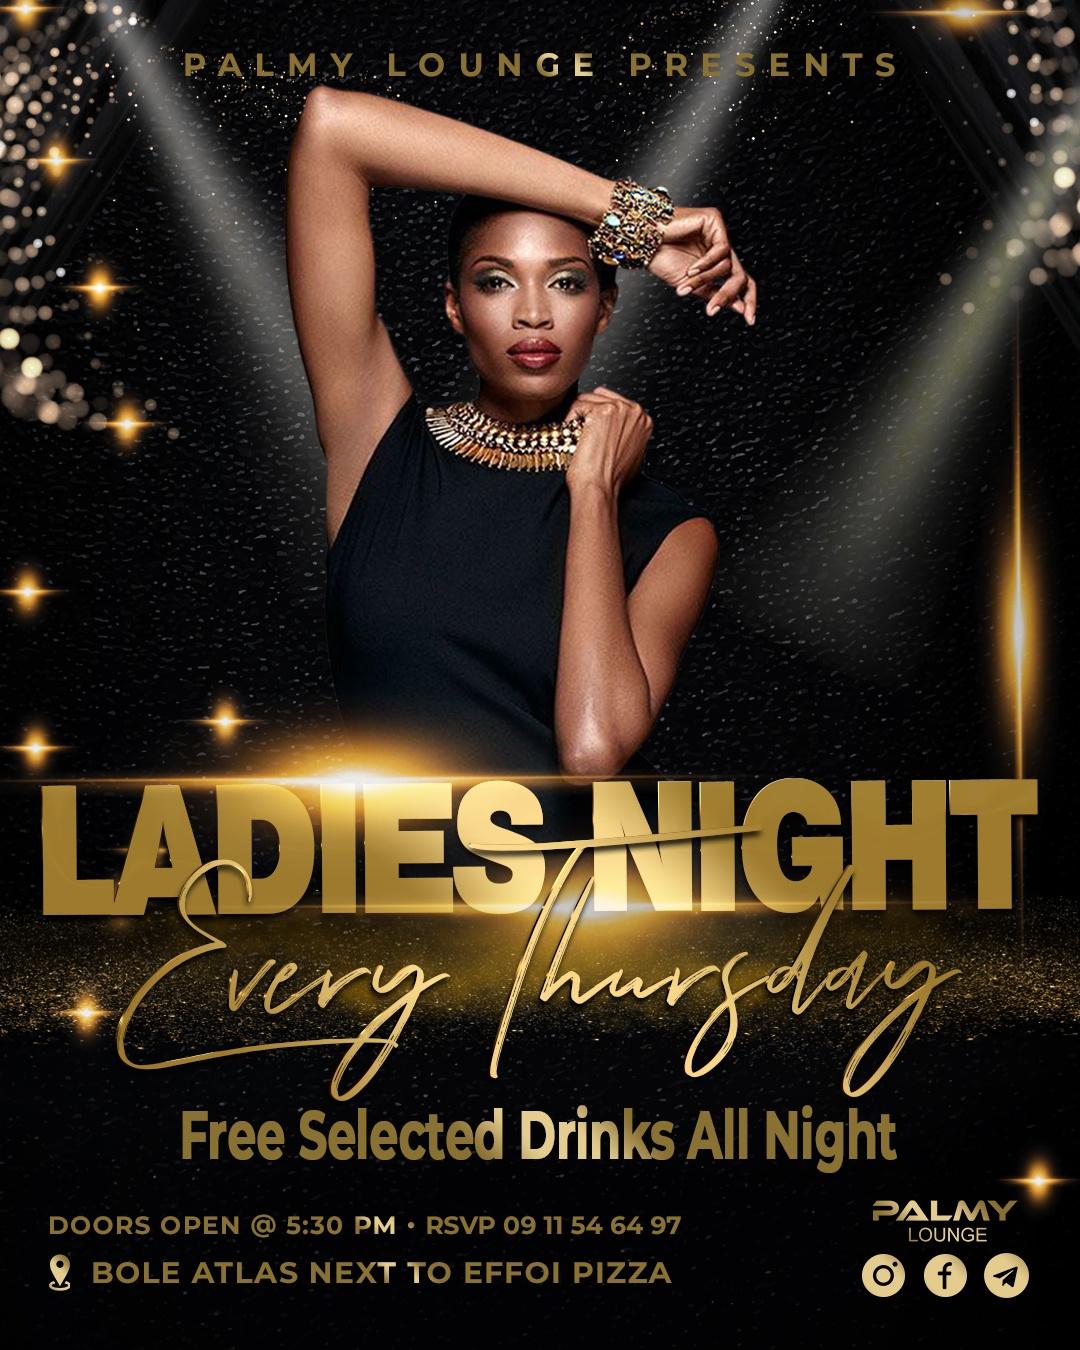 Ladies Night Every Thursday